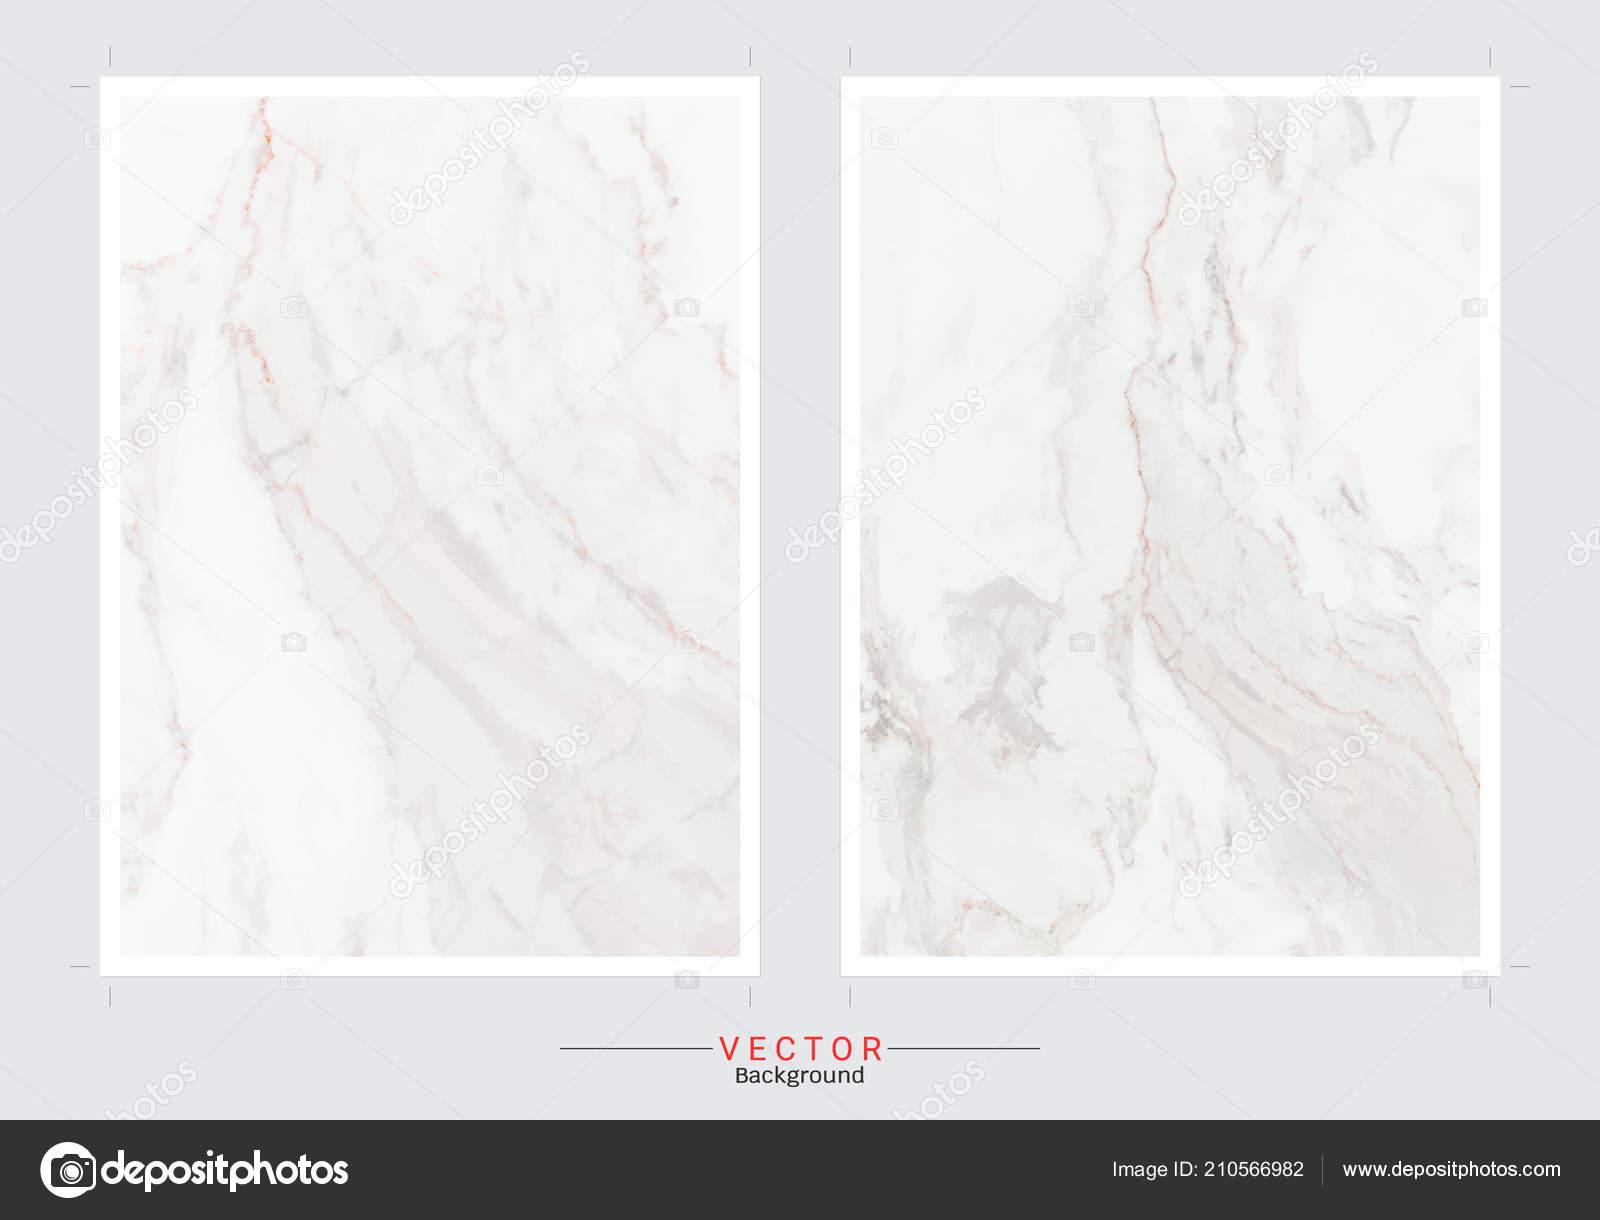 Marble texture background premium luxury your design cards wedding marble texture background premium luxury your design cards wedding invitation vetores de stock stopboris Image collections